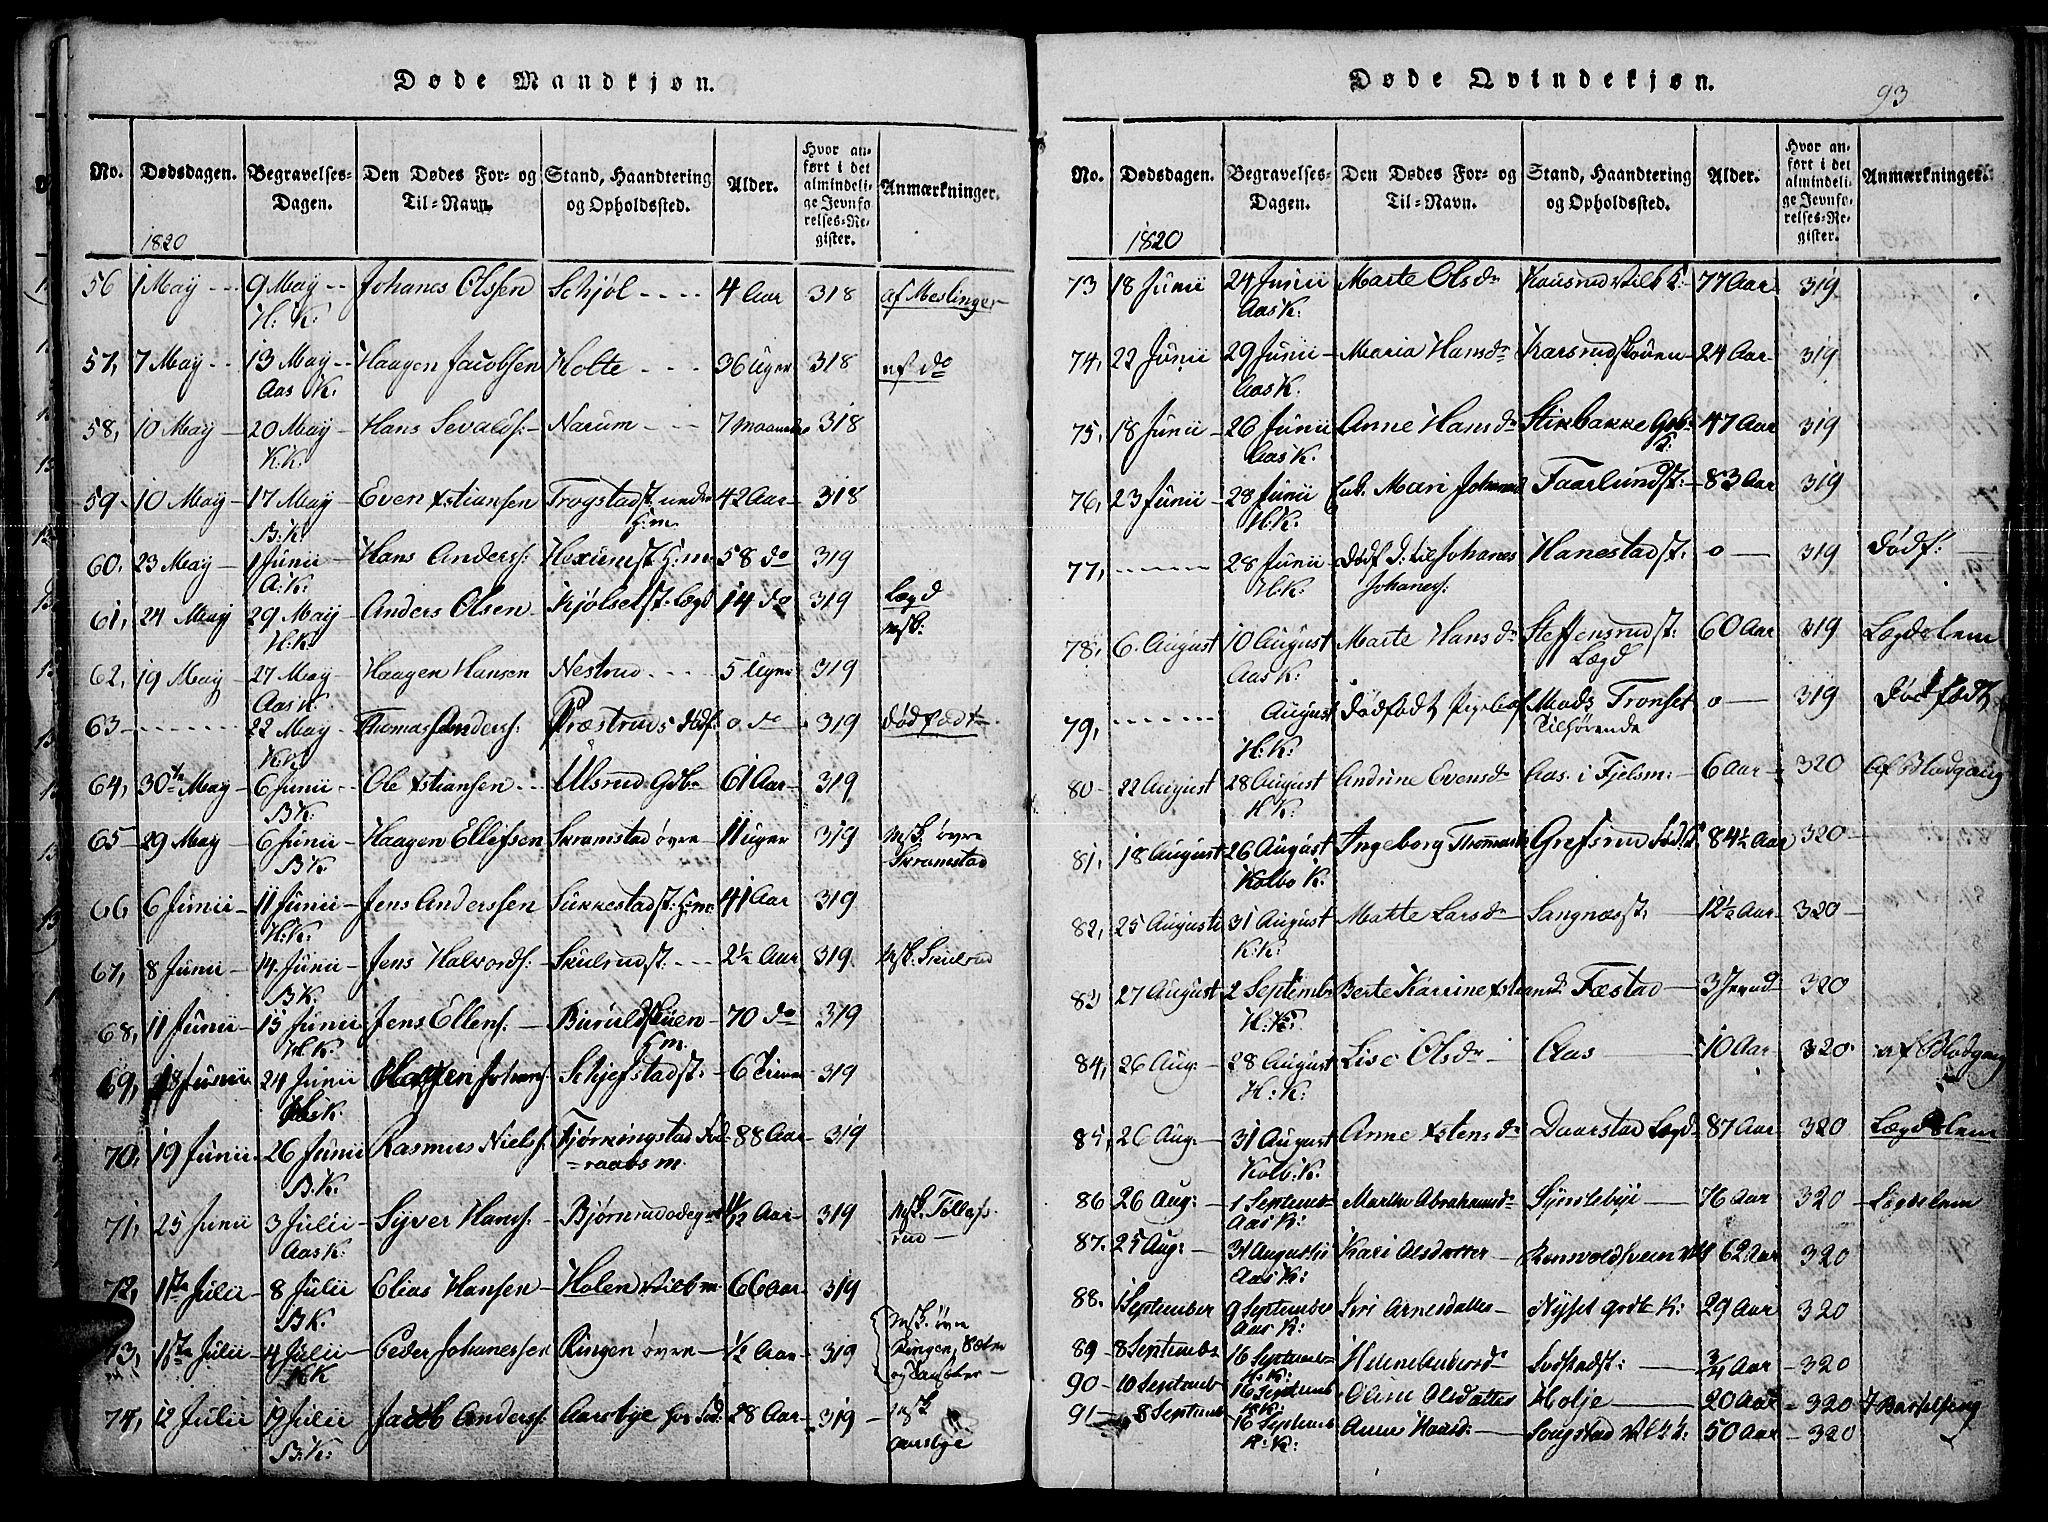 SAH, Toten prestekontor, Ministerialbok nr. 10, 1820-1828, s. 93